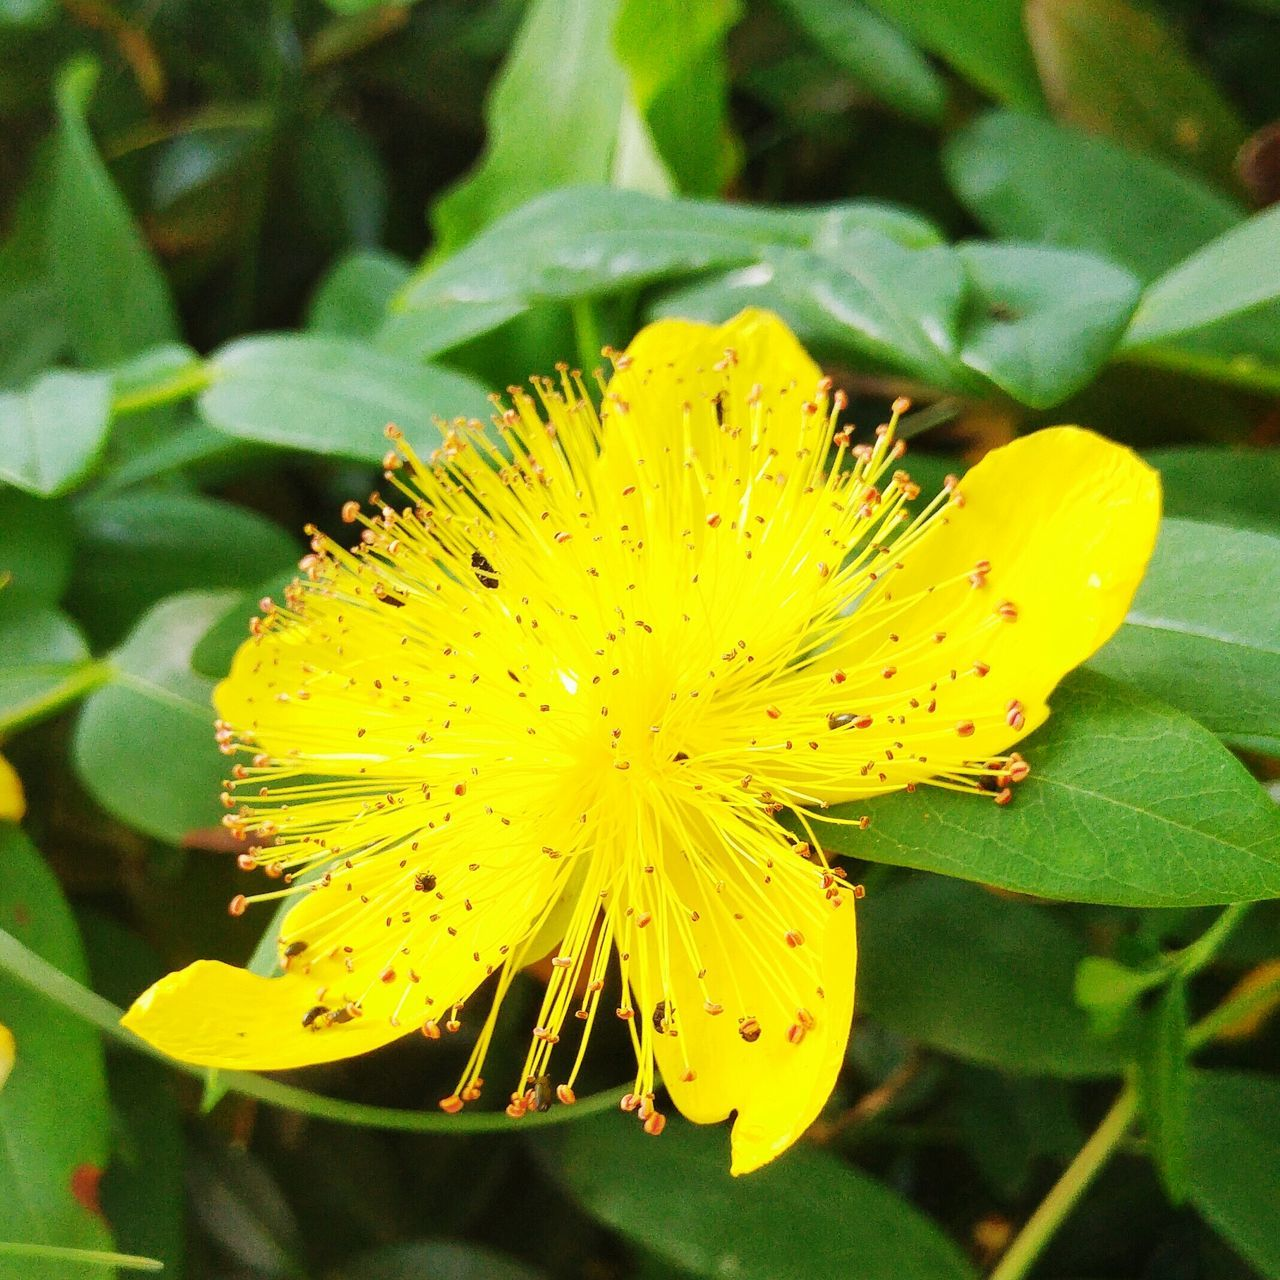 The OO Mission Blume Sun Yellow Flower Pixxart Nature Photographer Photography Flower